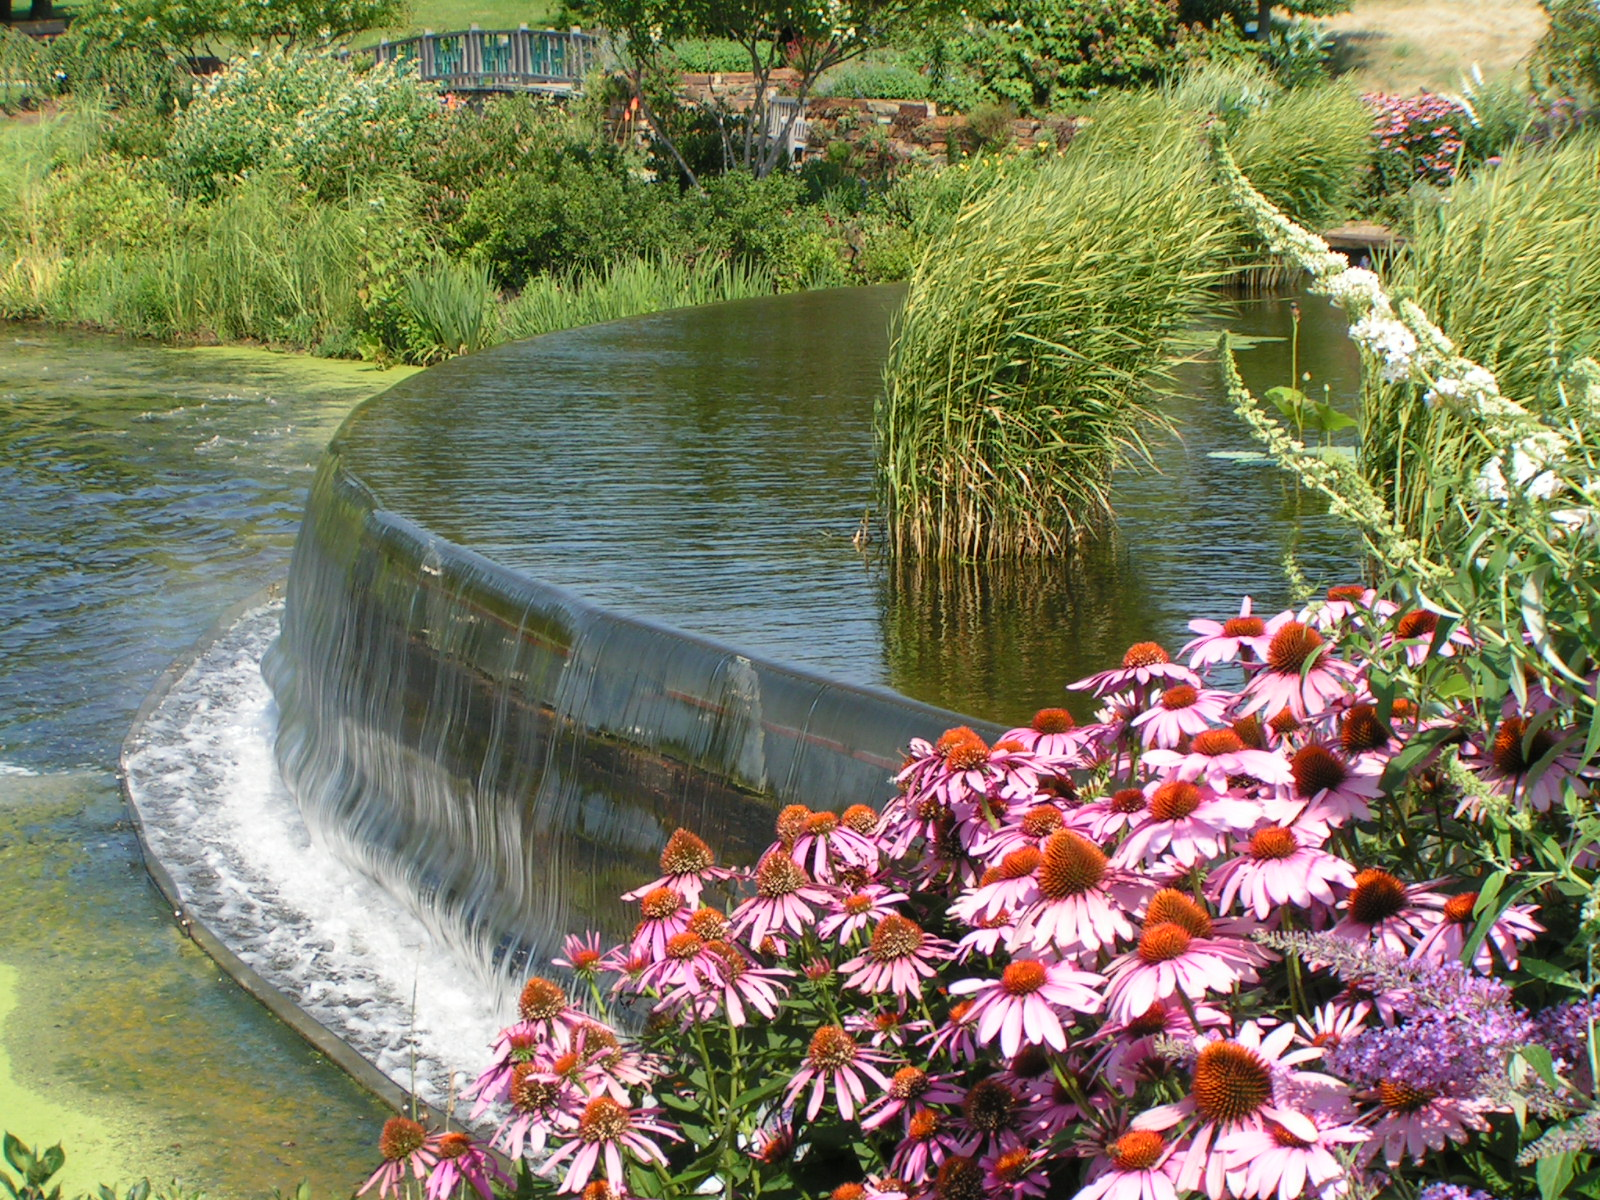 Water Garden, Bspo06, Flowers, Garden, Green, HQ Photo